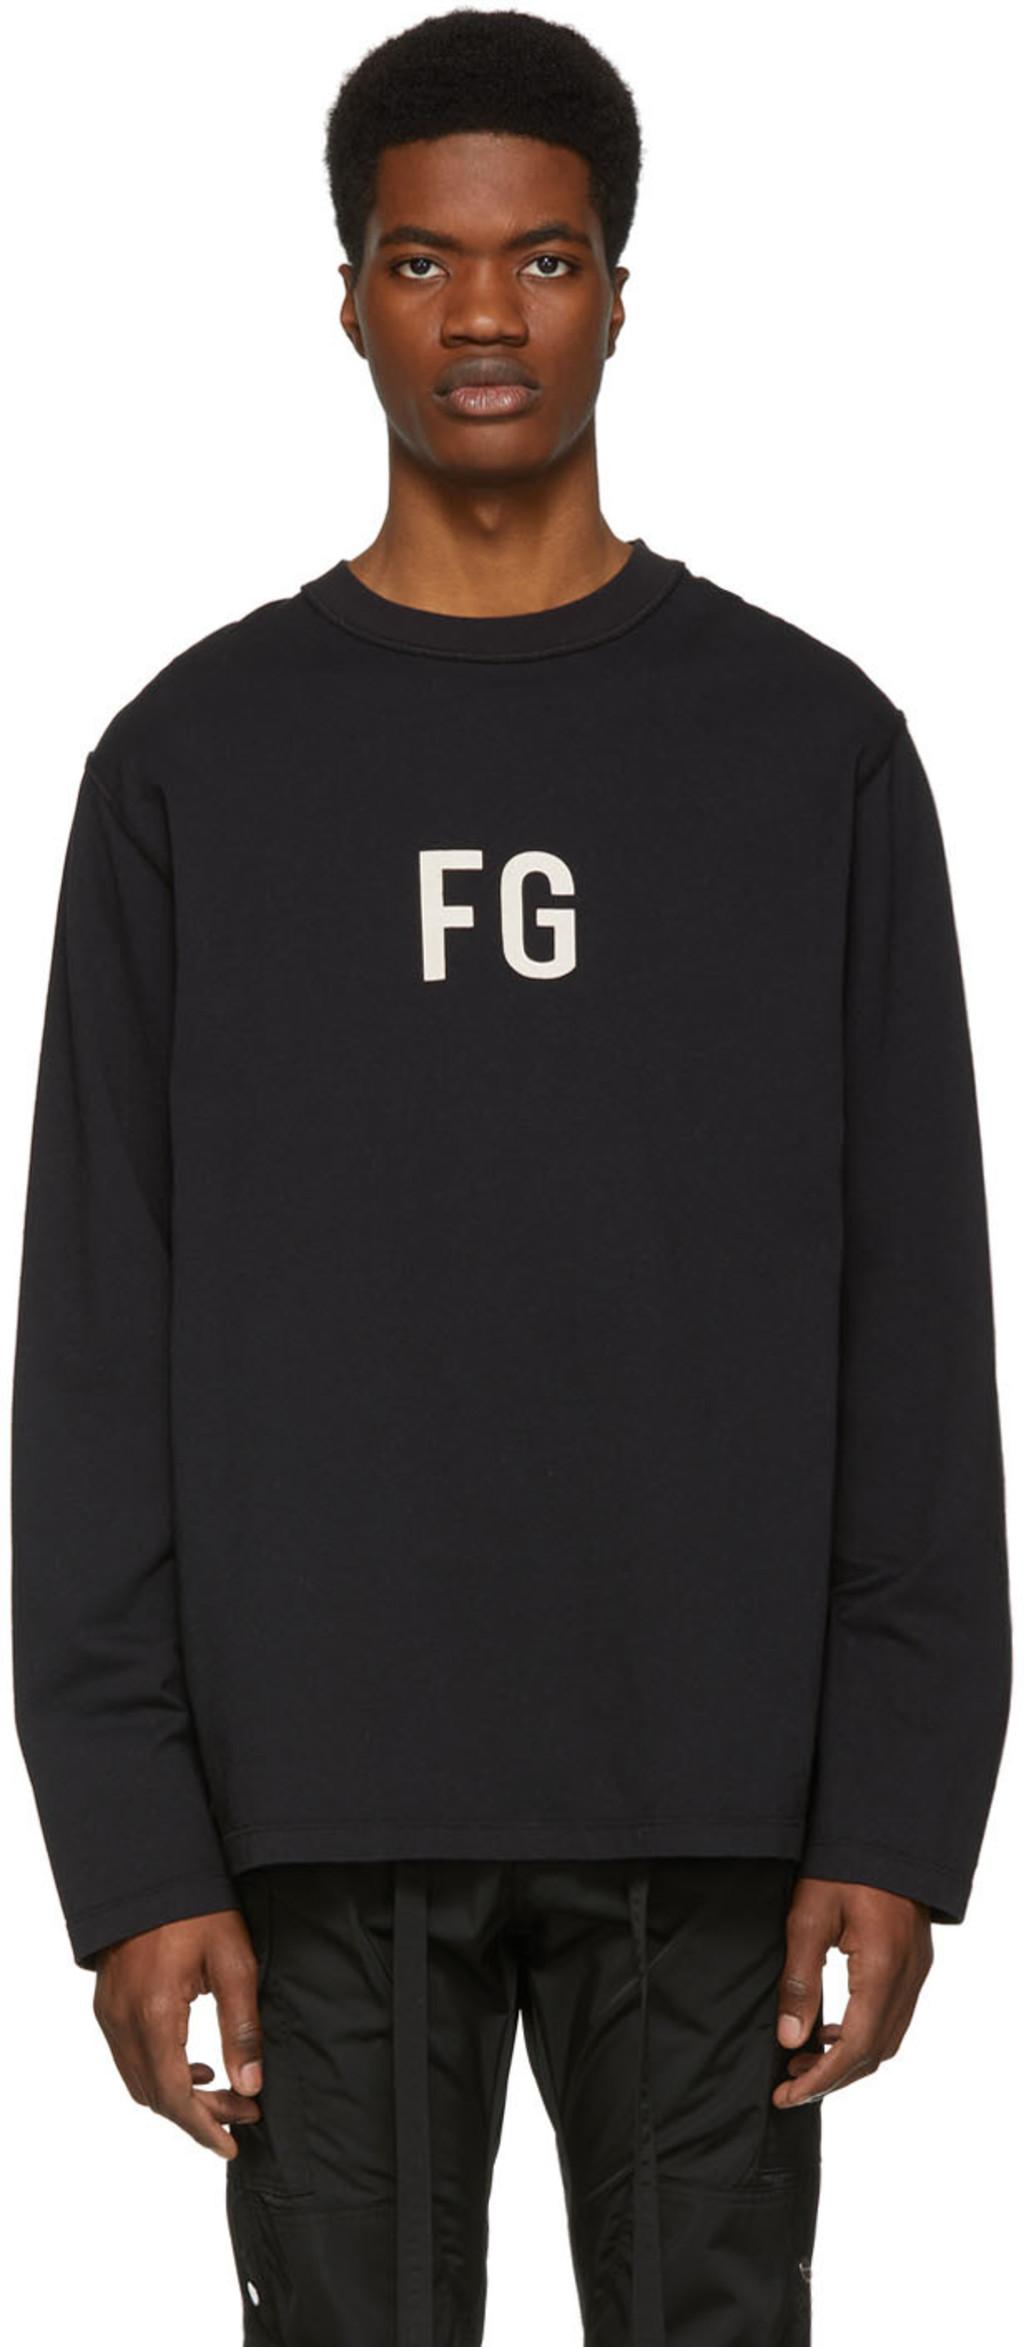 a3942e47a Black 'FG' Long Sleeve T-Shirt